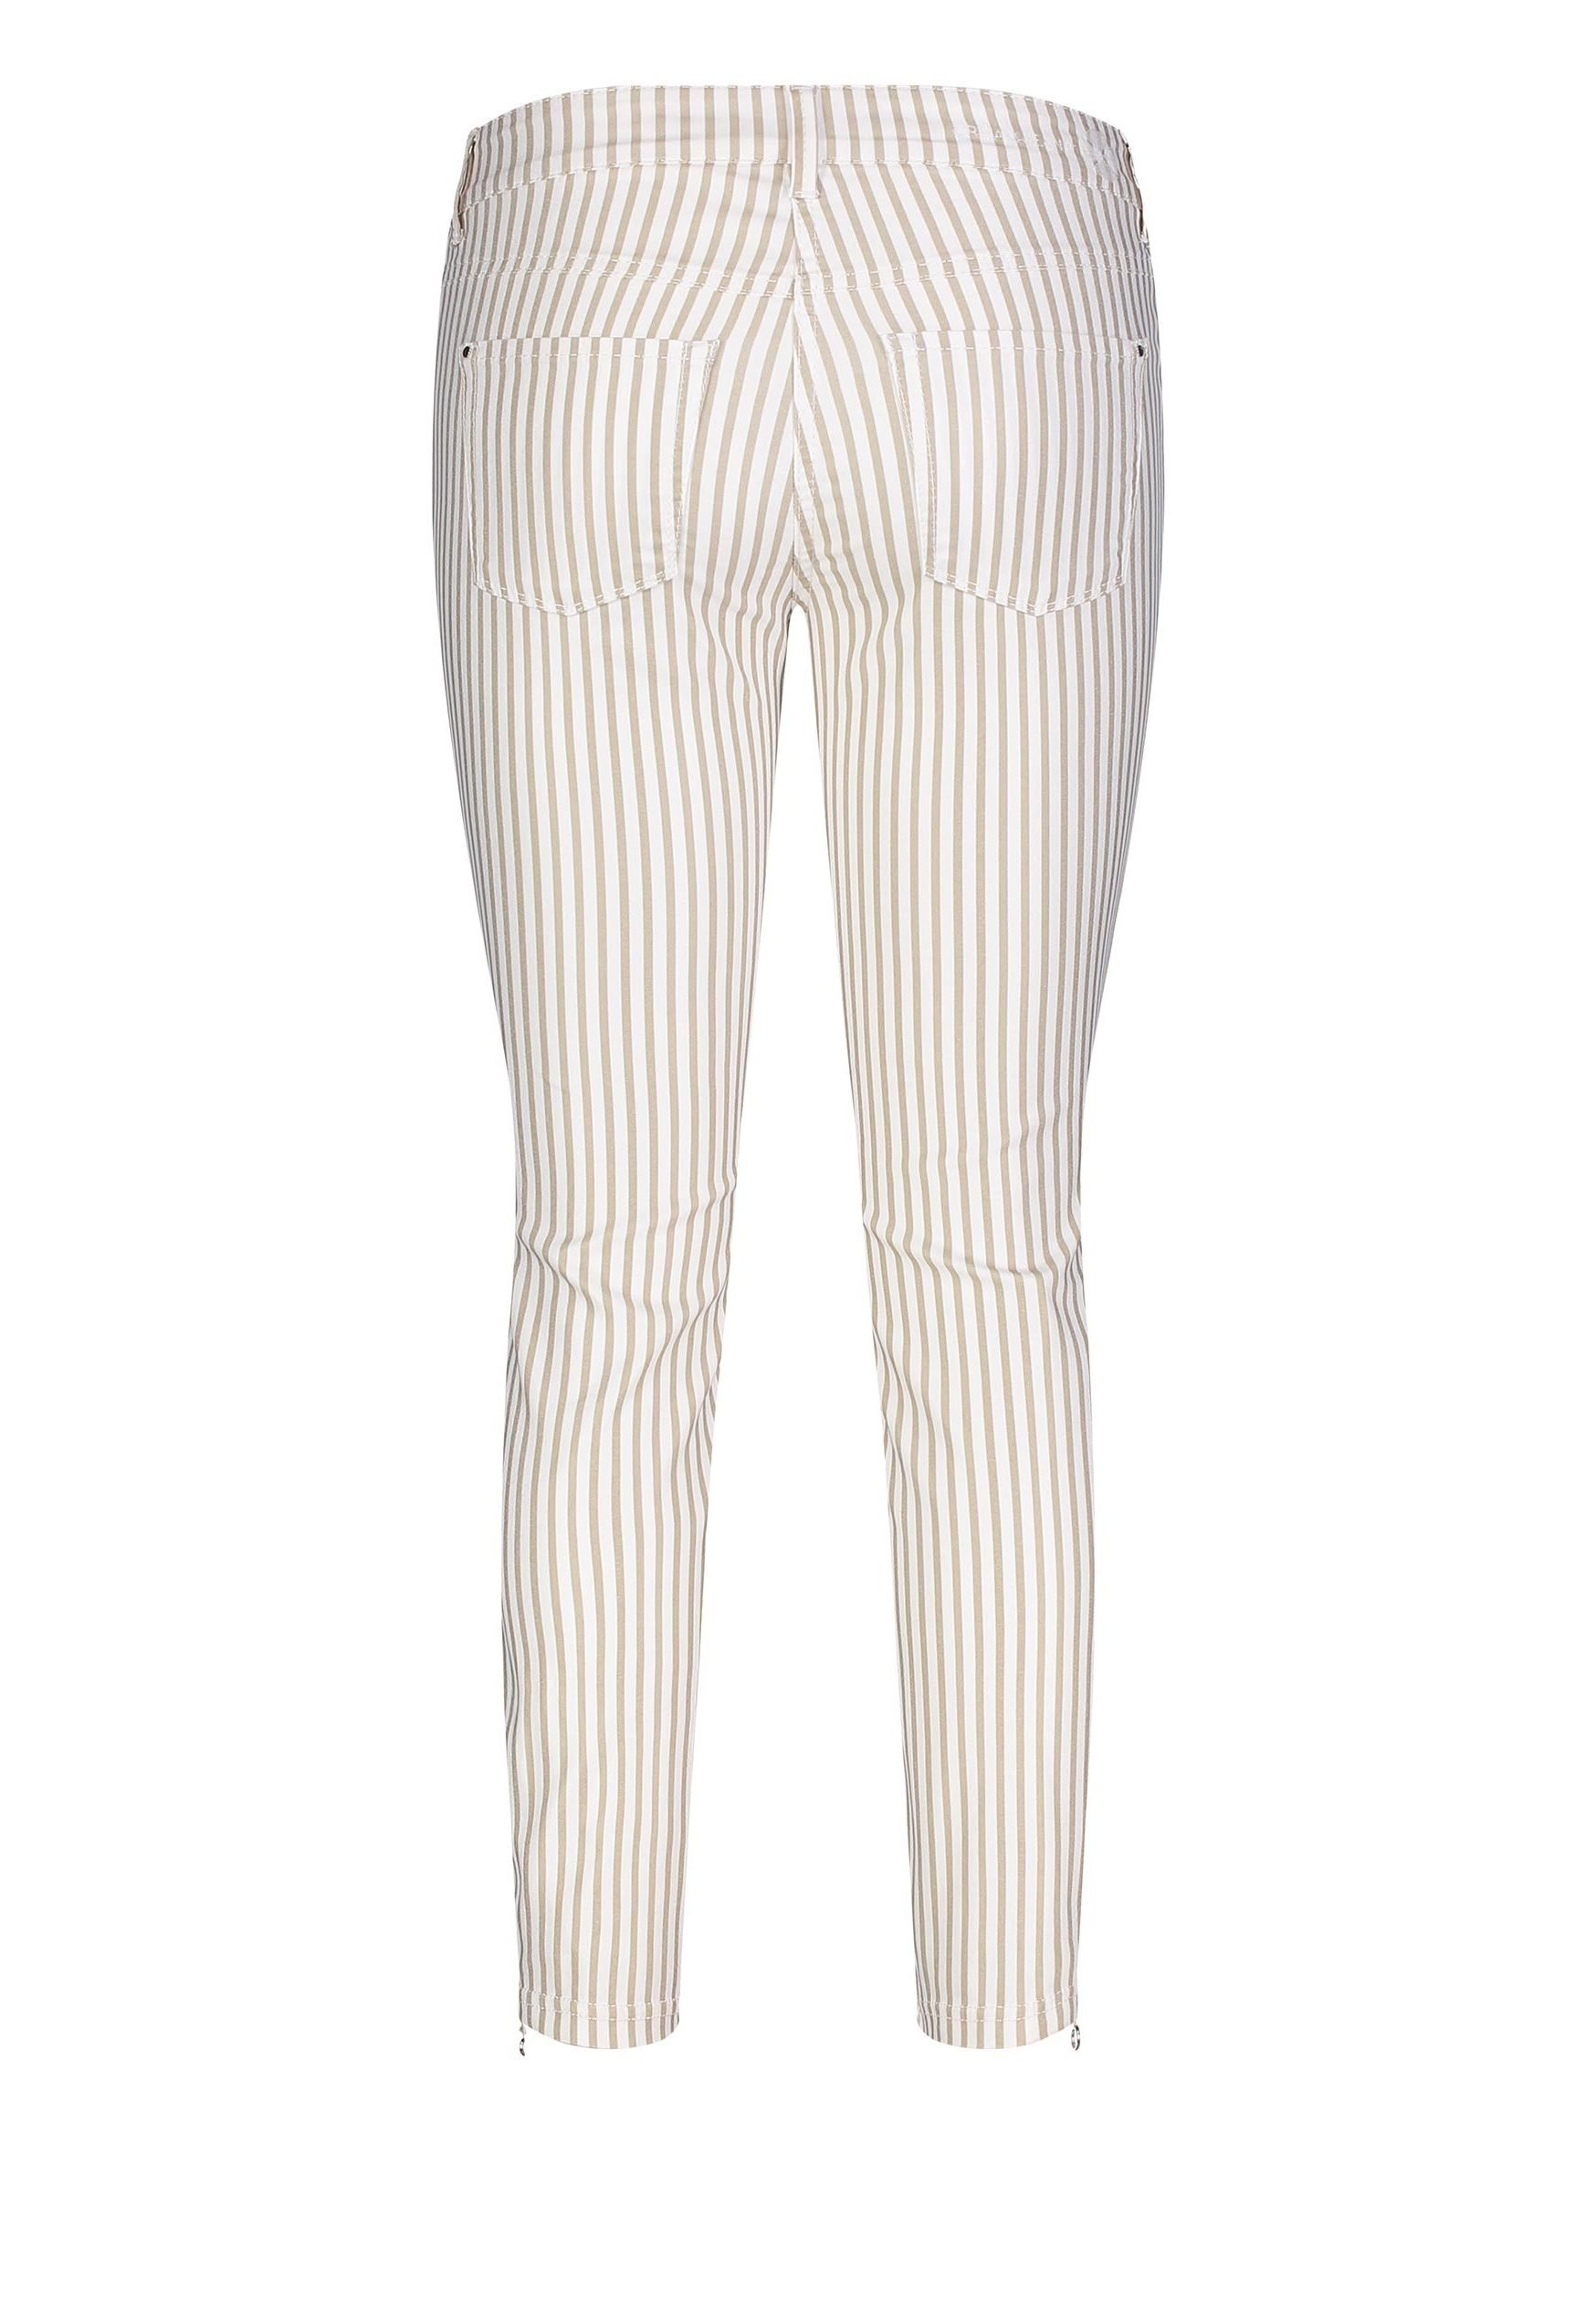 Mac Jeans Dream Chic - Trousers Beige